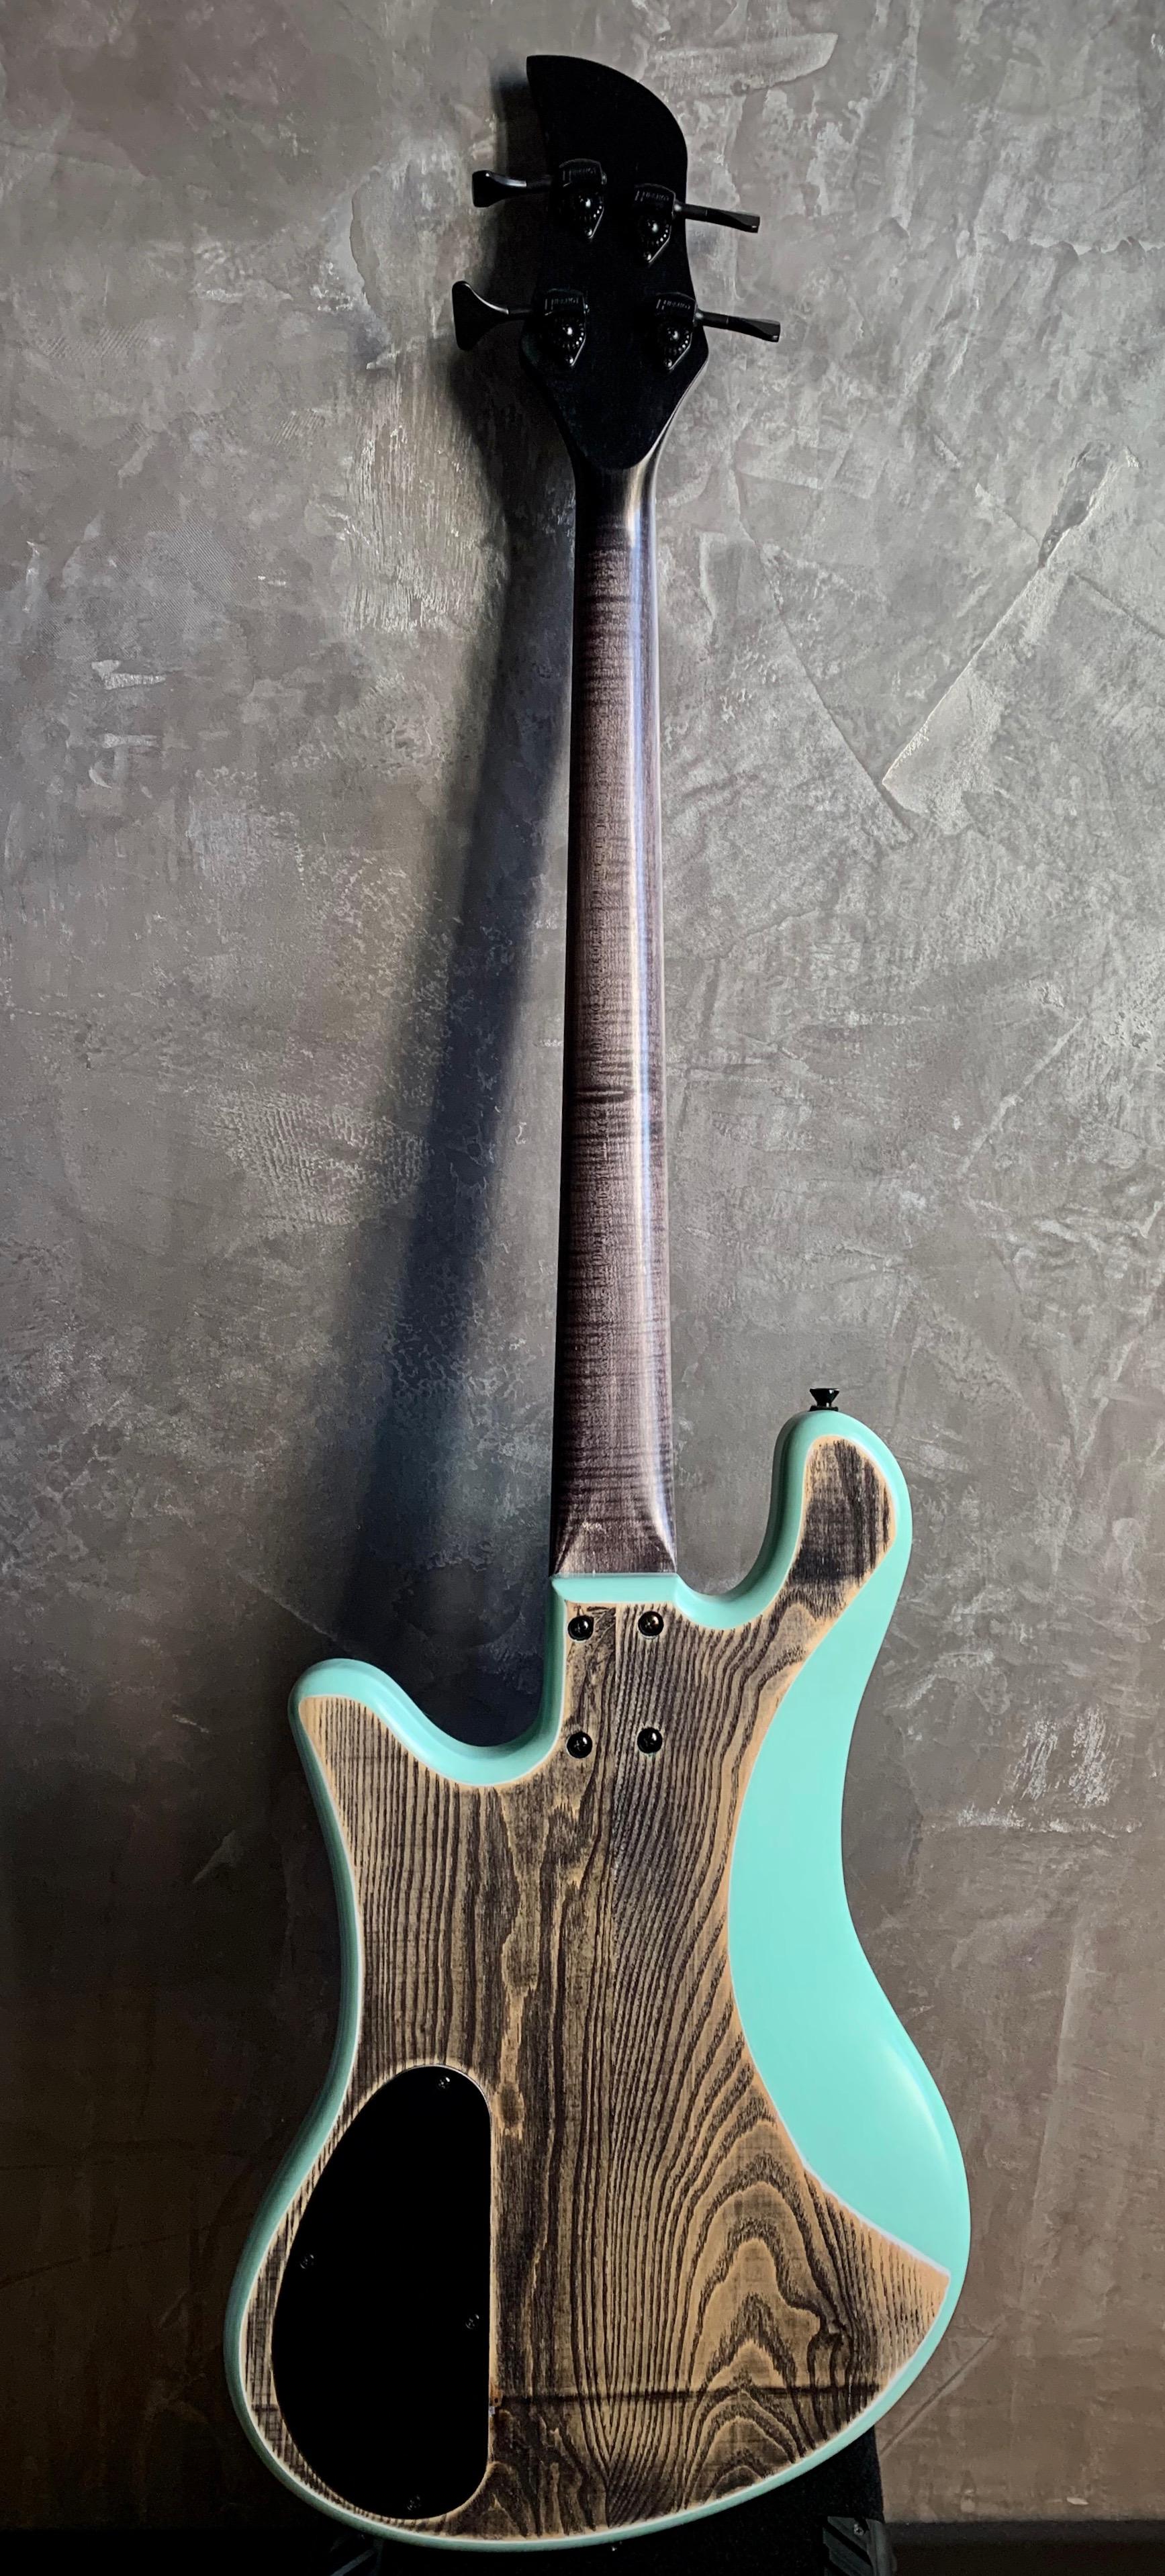 Swing bass gallucci 2